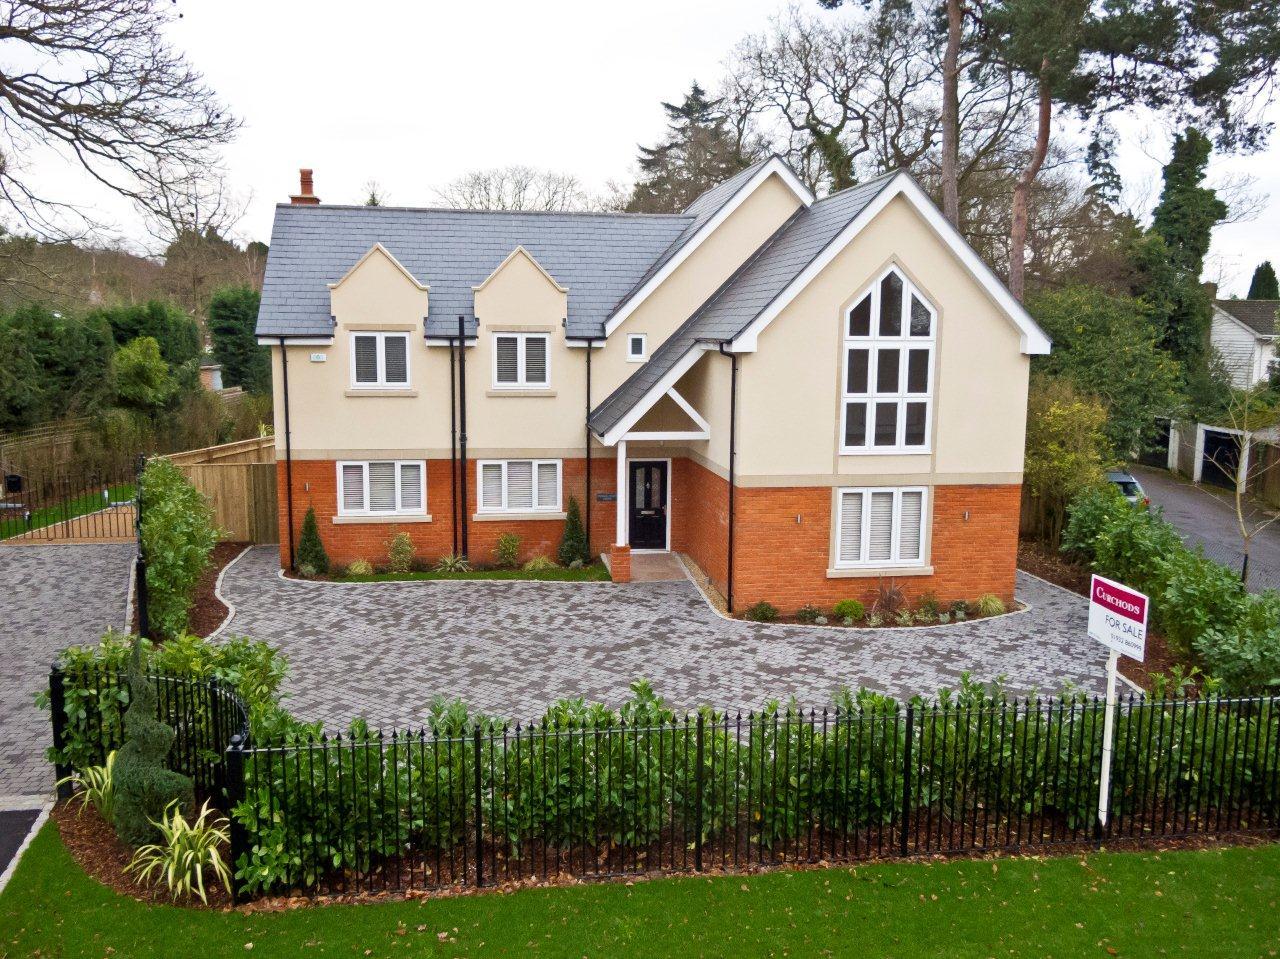 Fairmile House - Sold